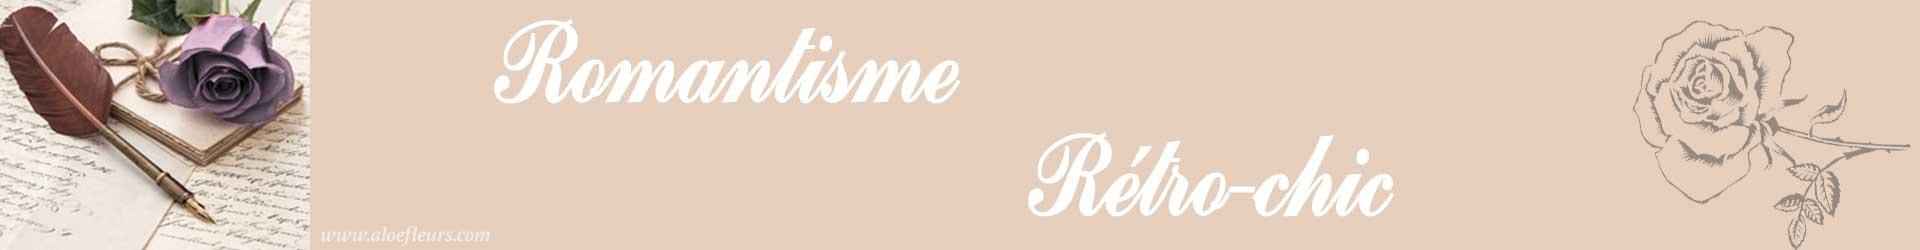 slide-bouquet-mariee-tendance-romantique-aloefleurs.com